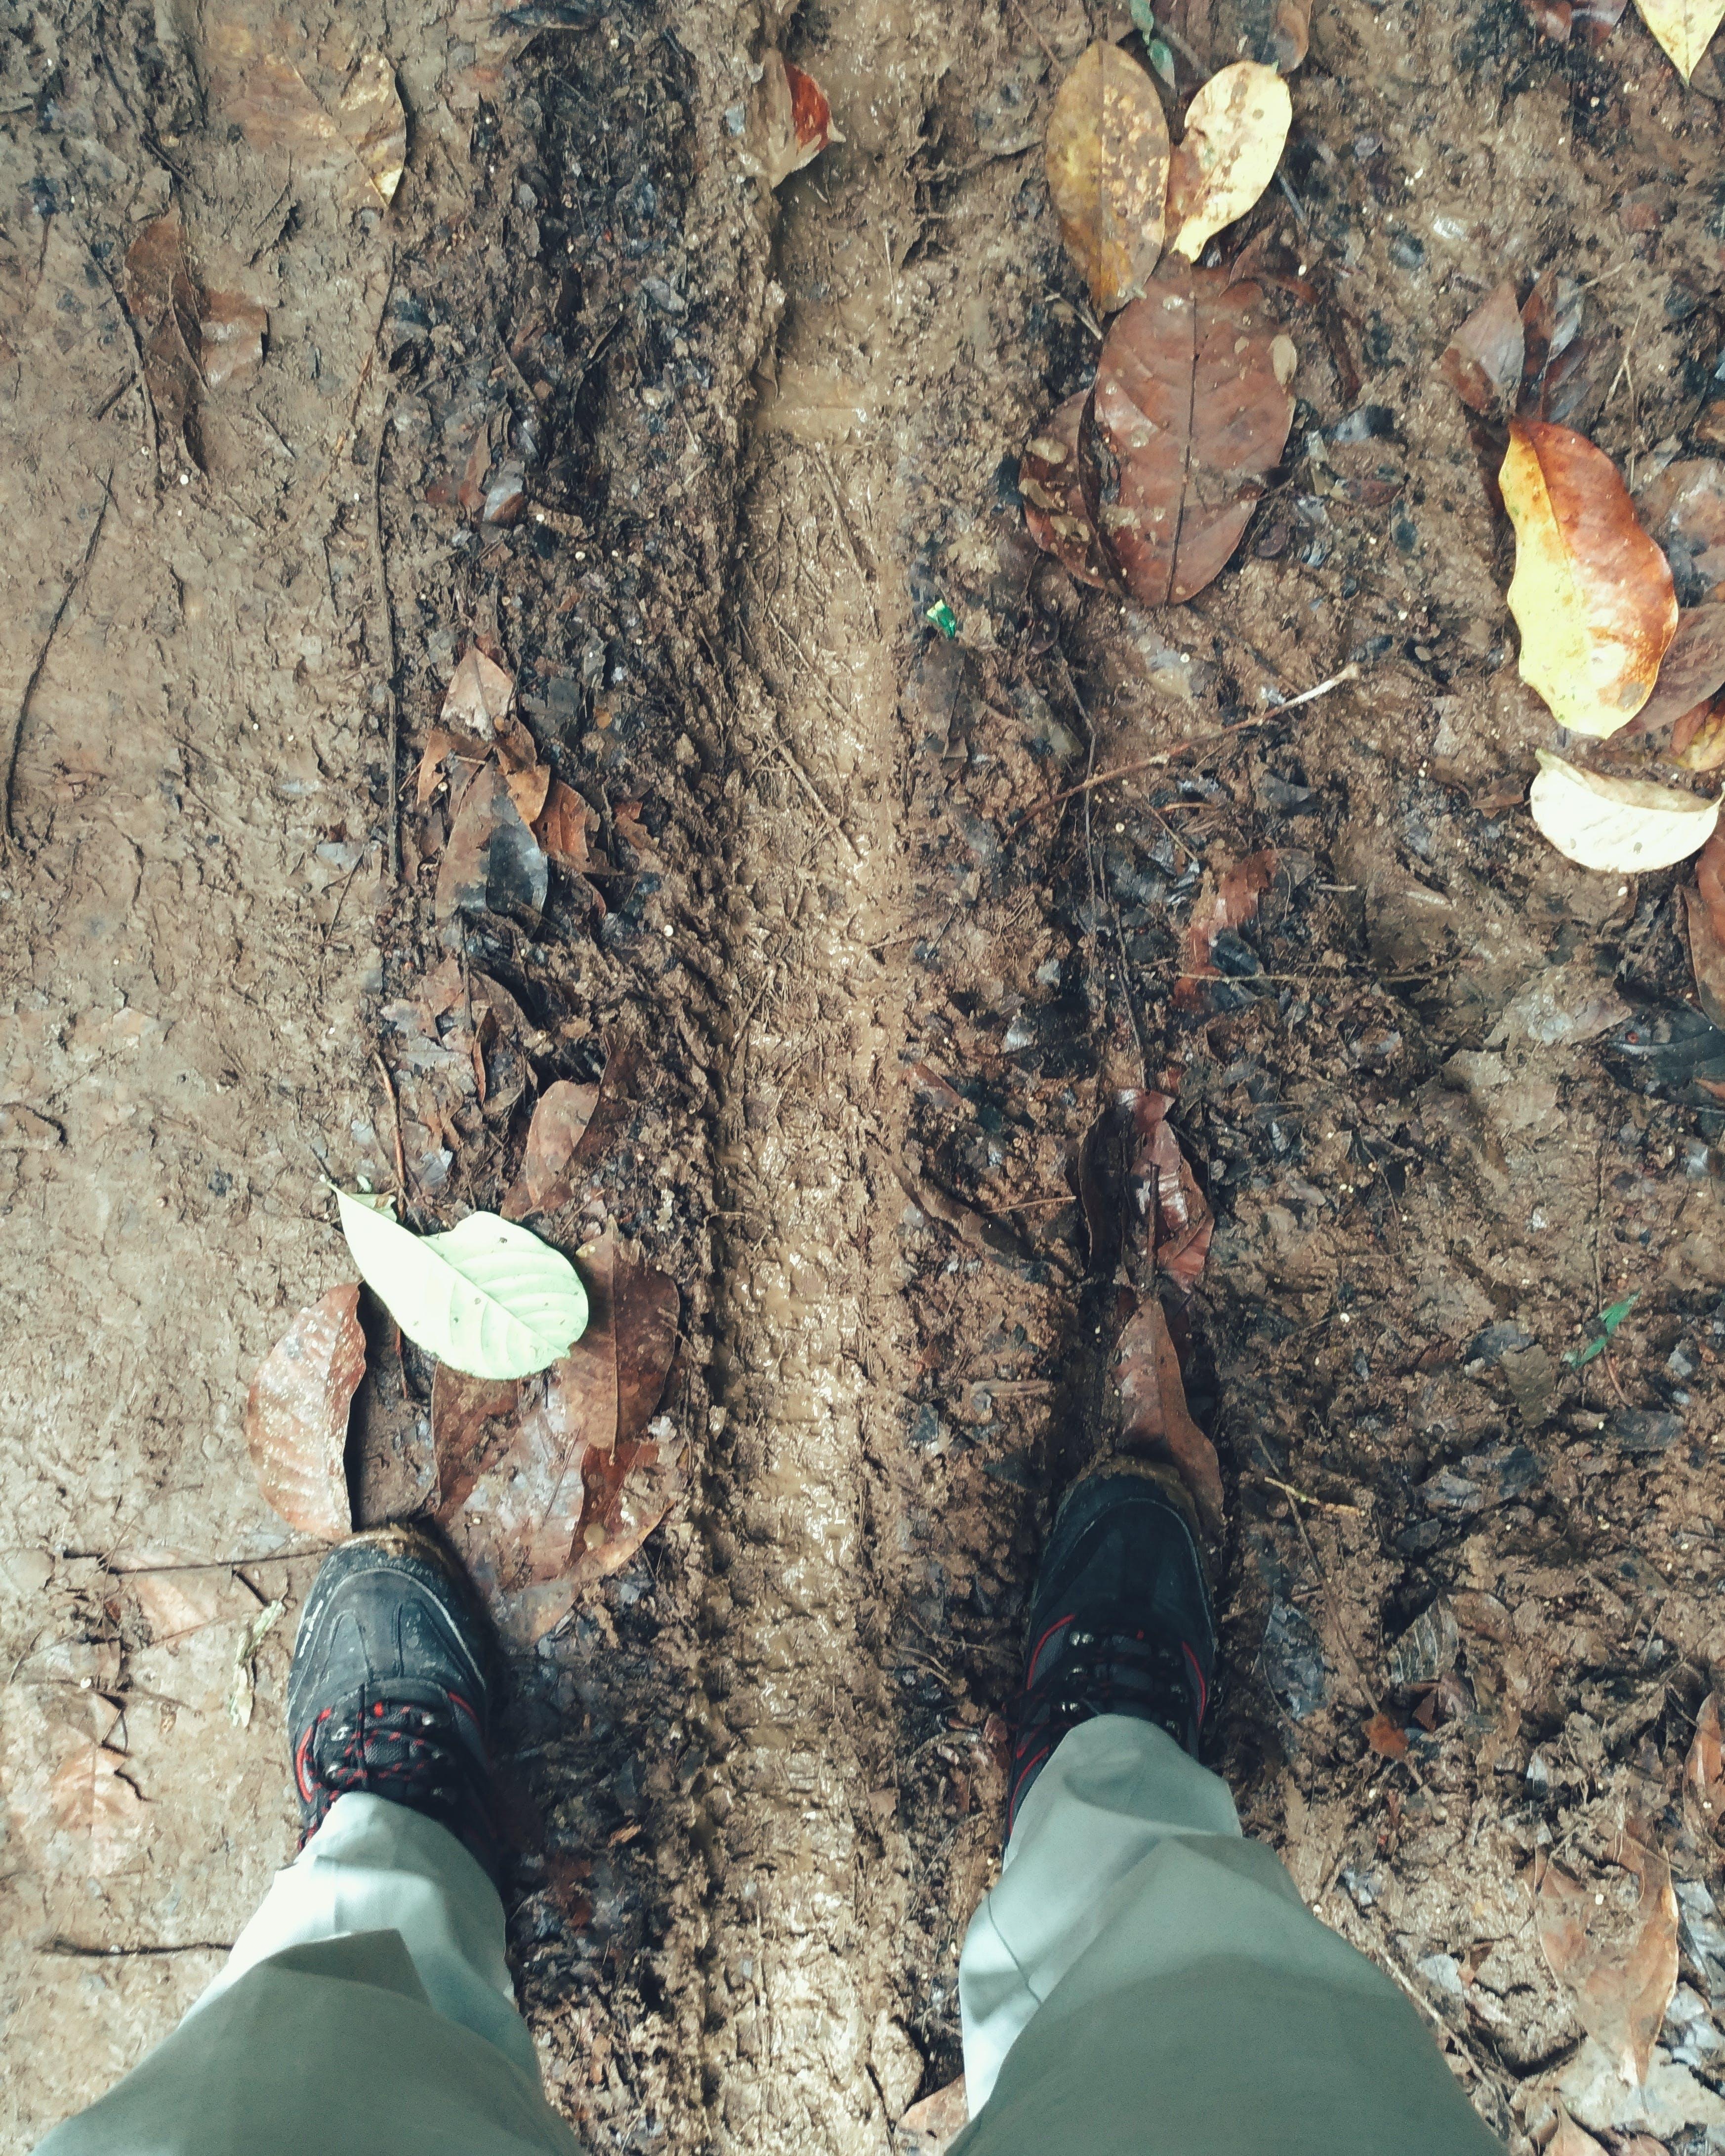 Free stock photo of #adventure #nature #wilderness #travel #trip #feet